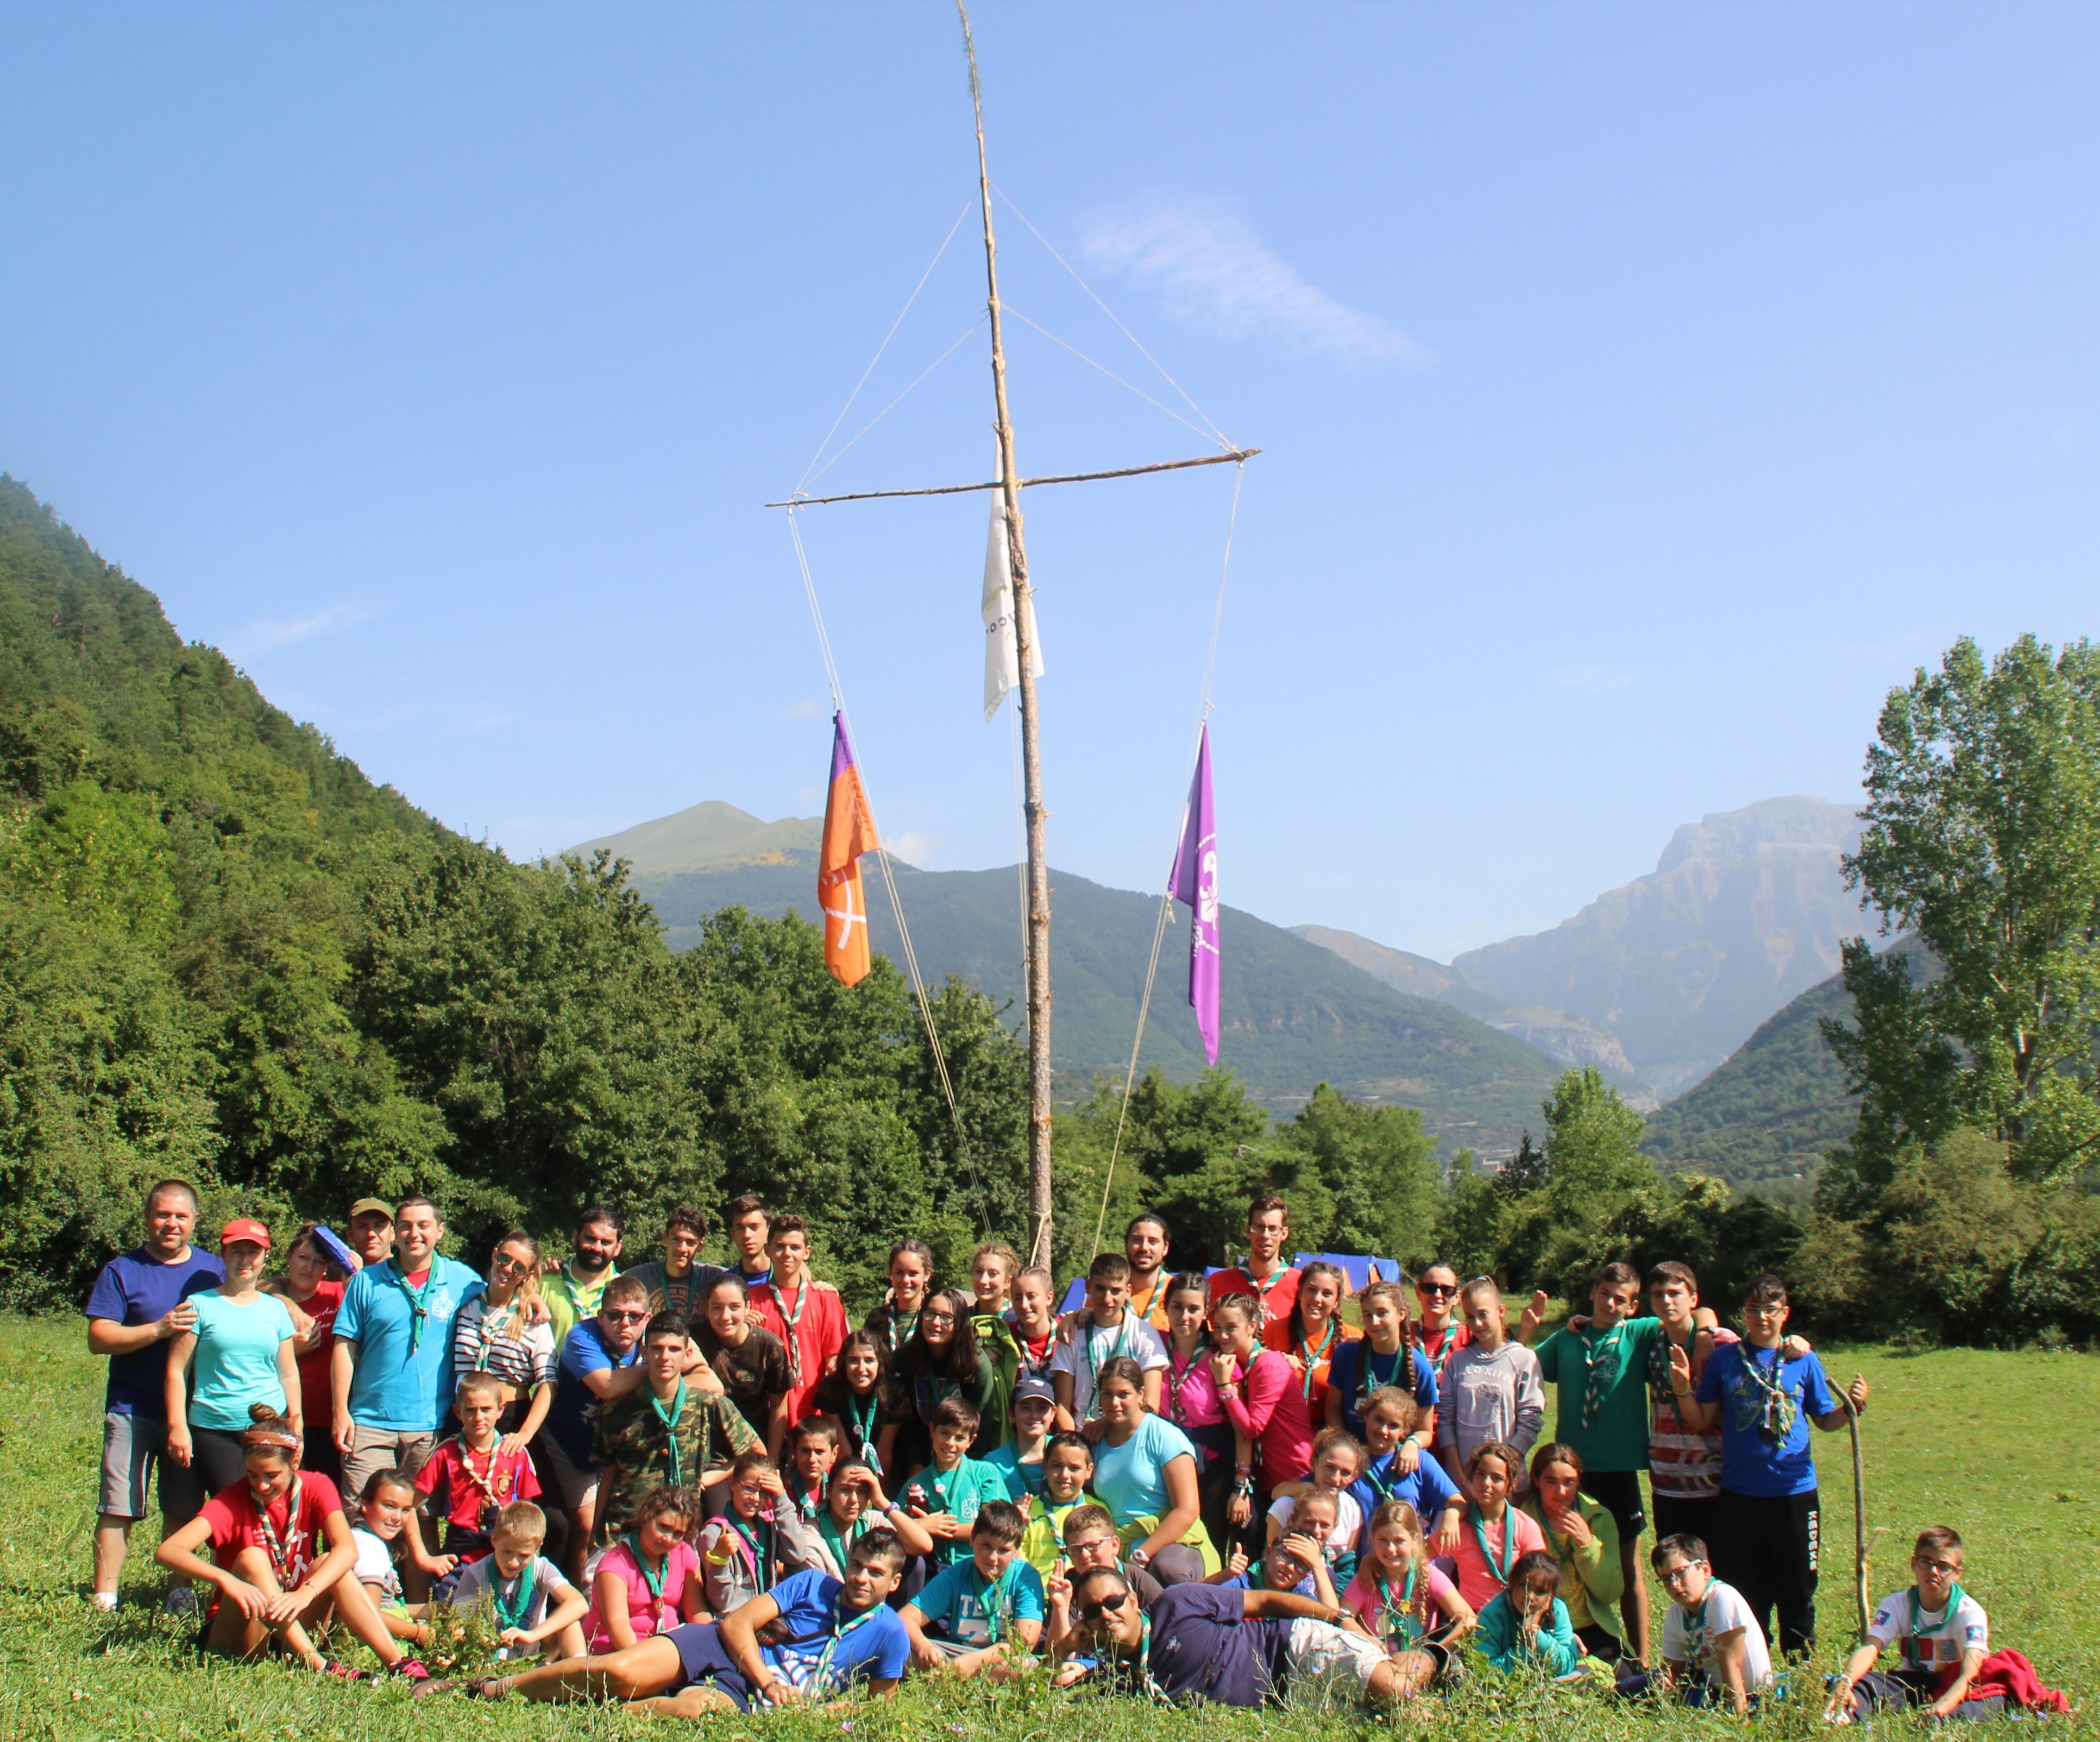 15-16 - Grupo - Campamento de verano - P177